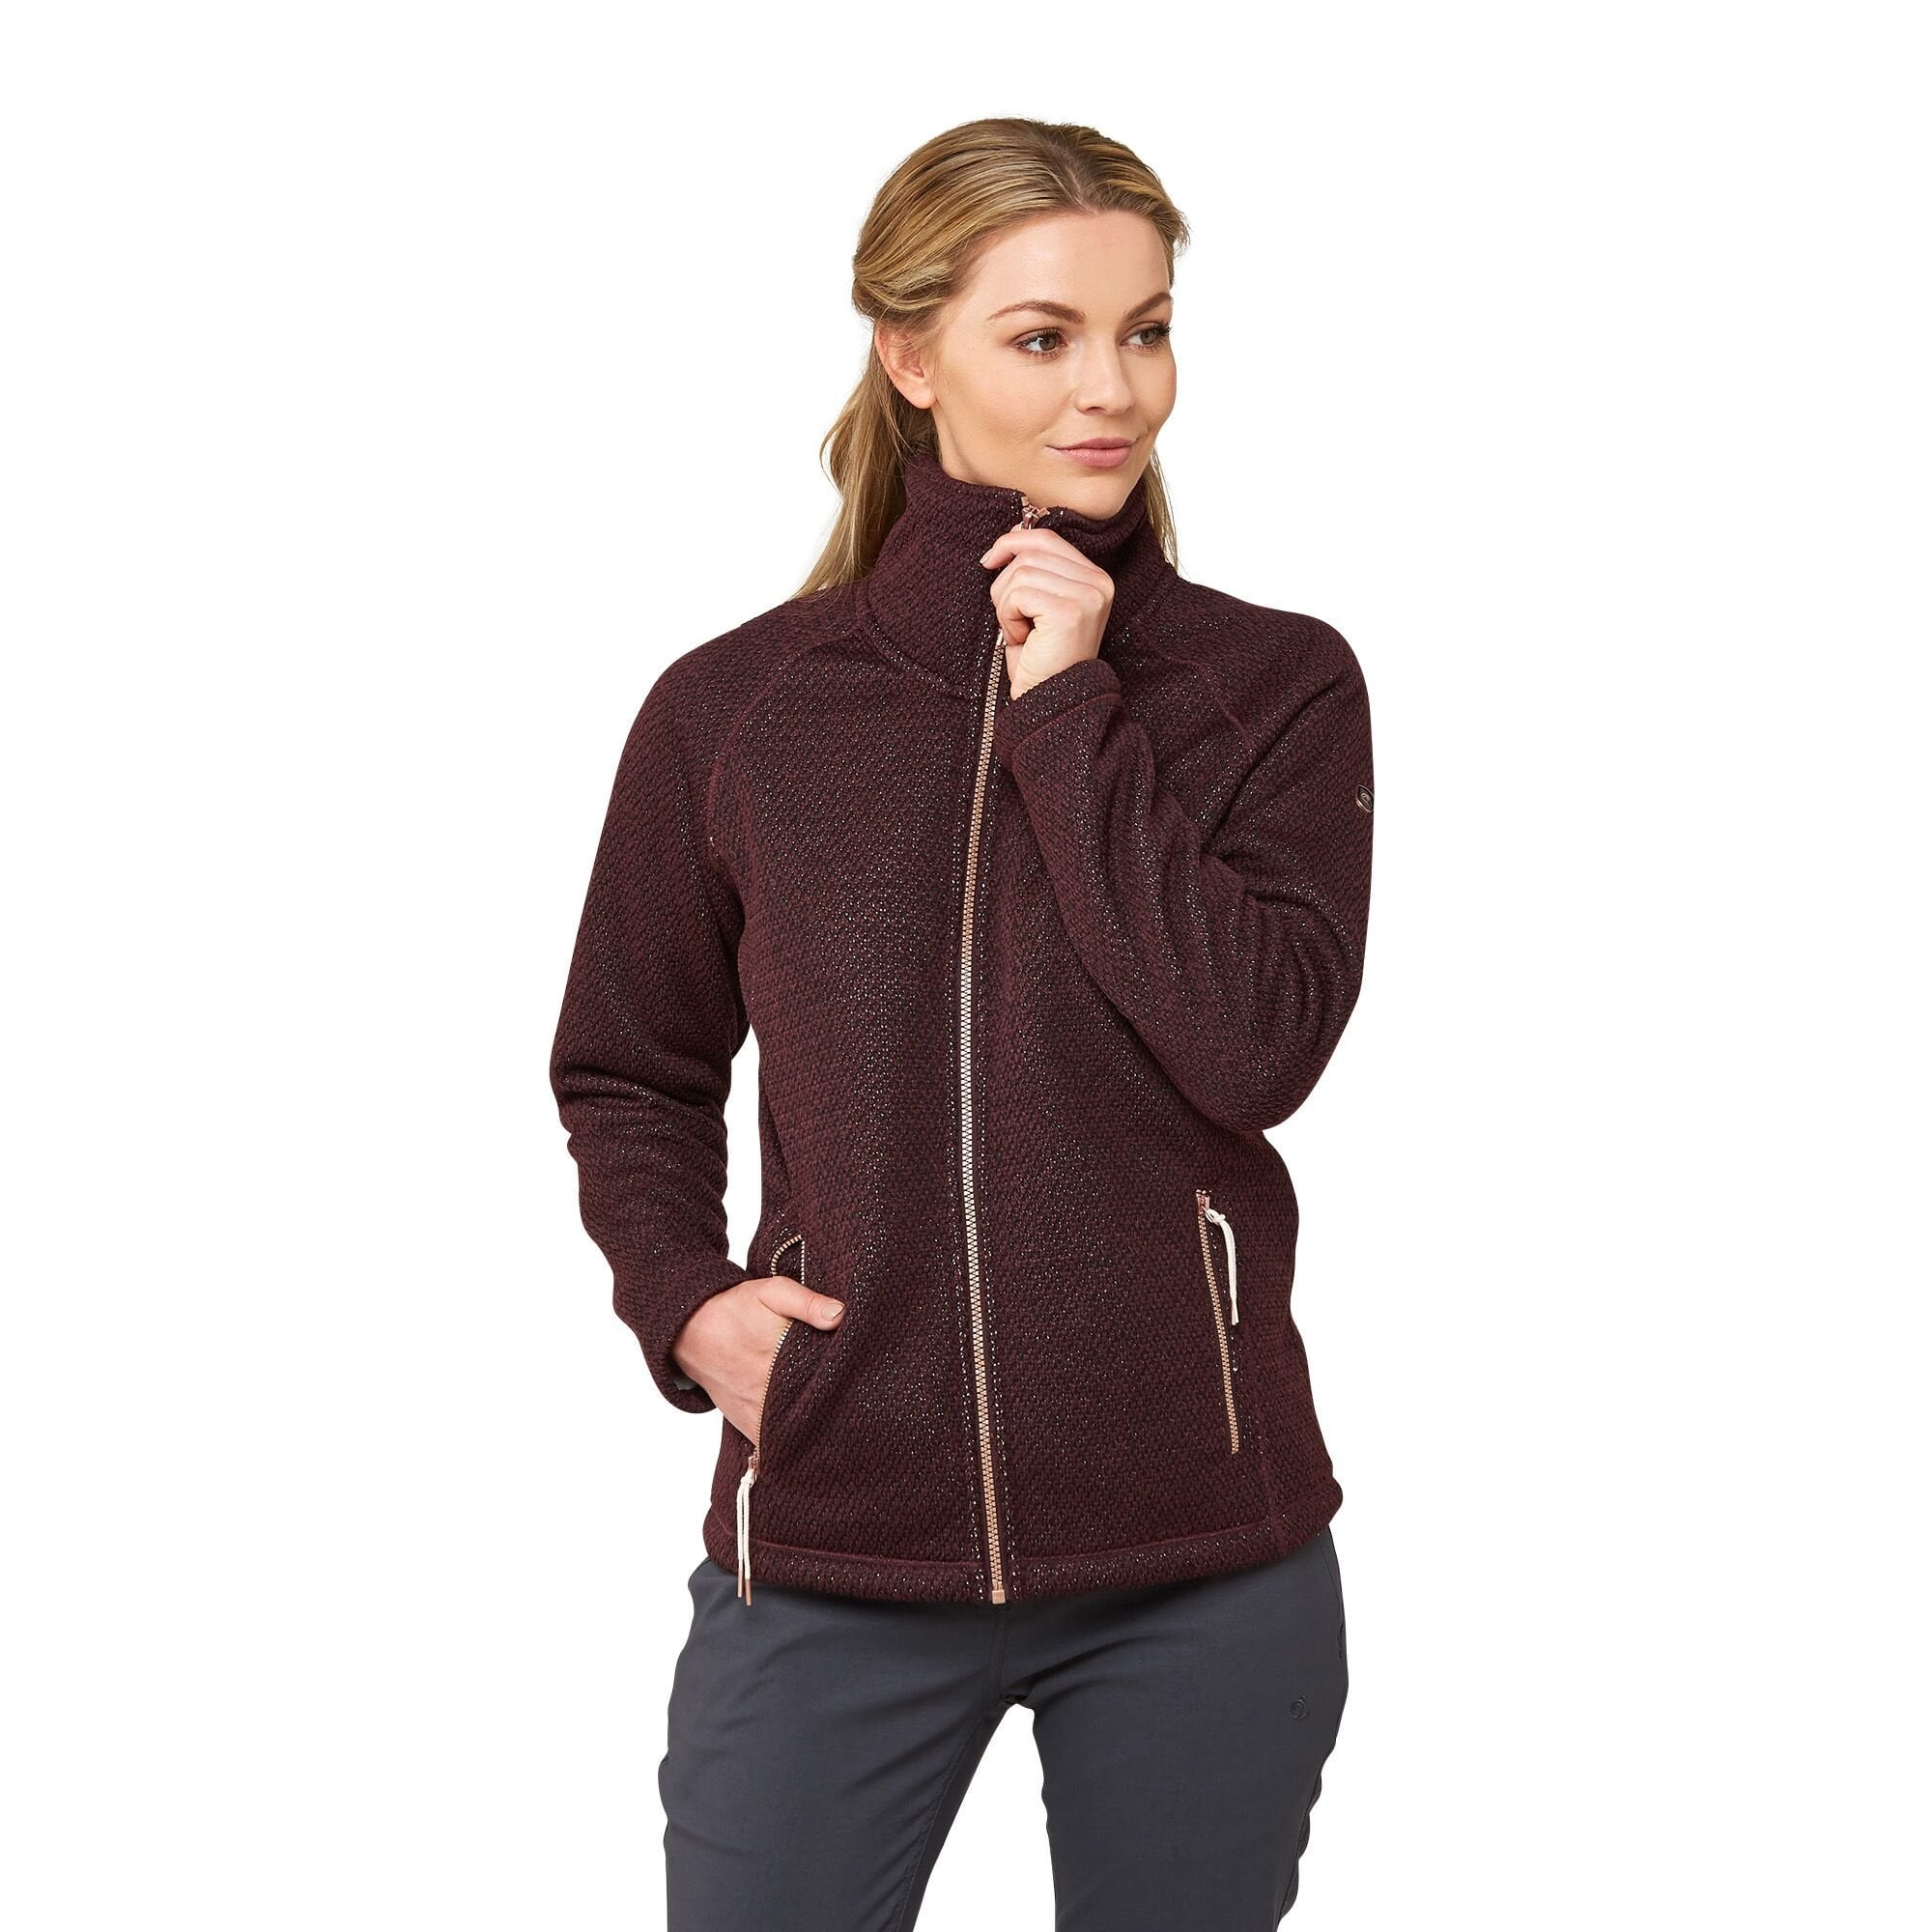 Craghoppers Womens Nairn Fleece Jacket